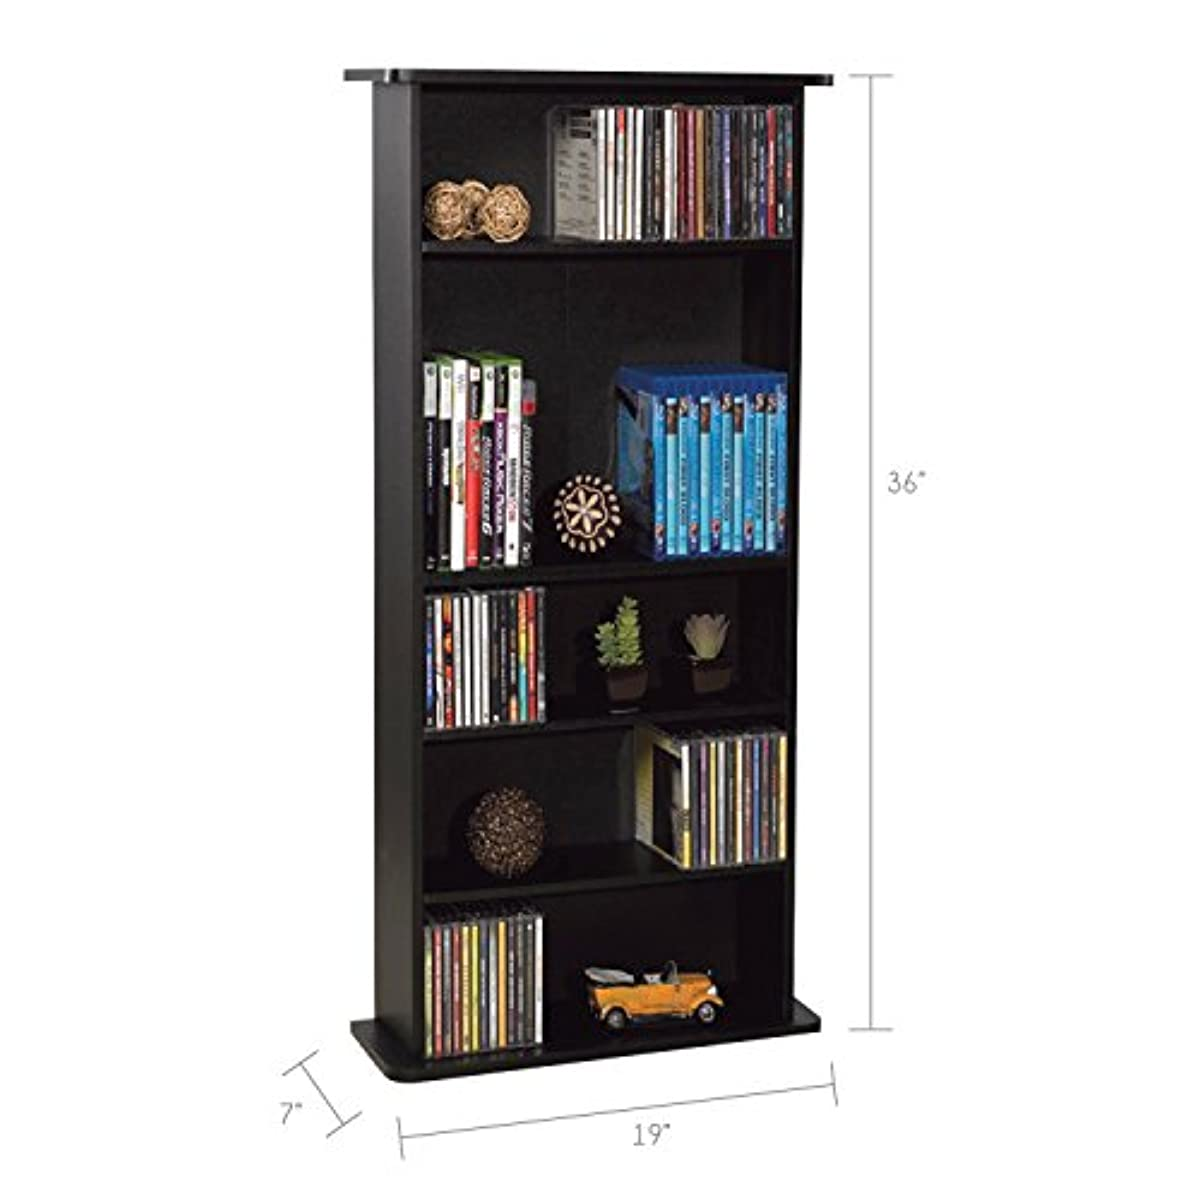 Muebles gabinete estantes almacenamiento estanteria para for Gabinete de almacenamiento de bano barato